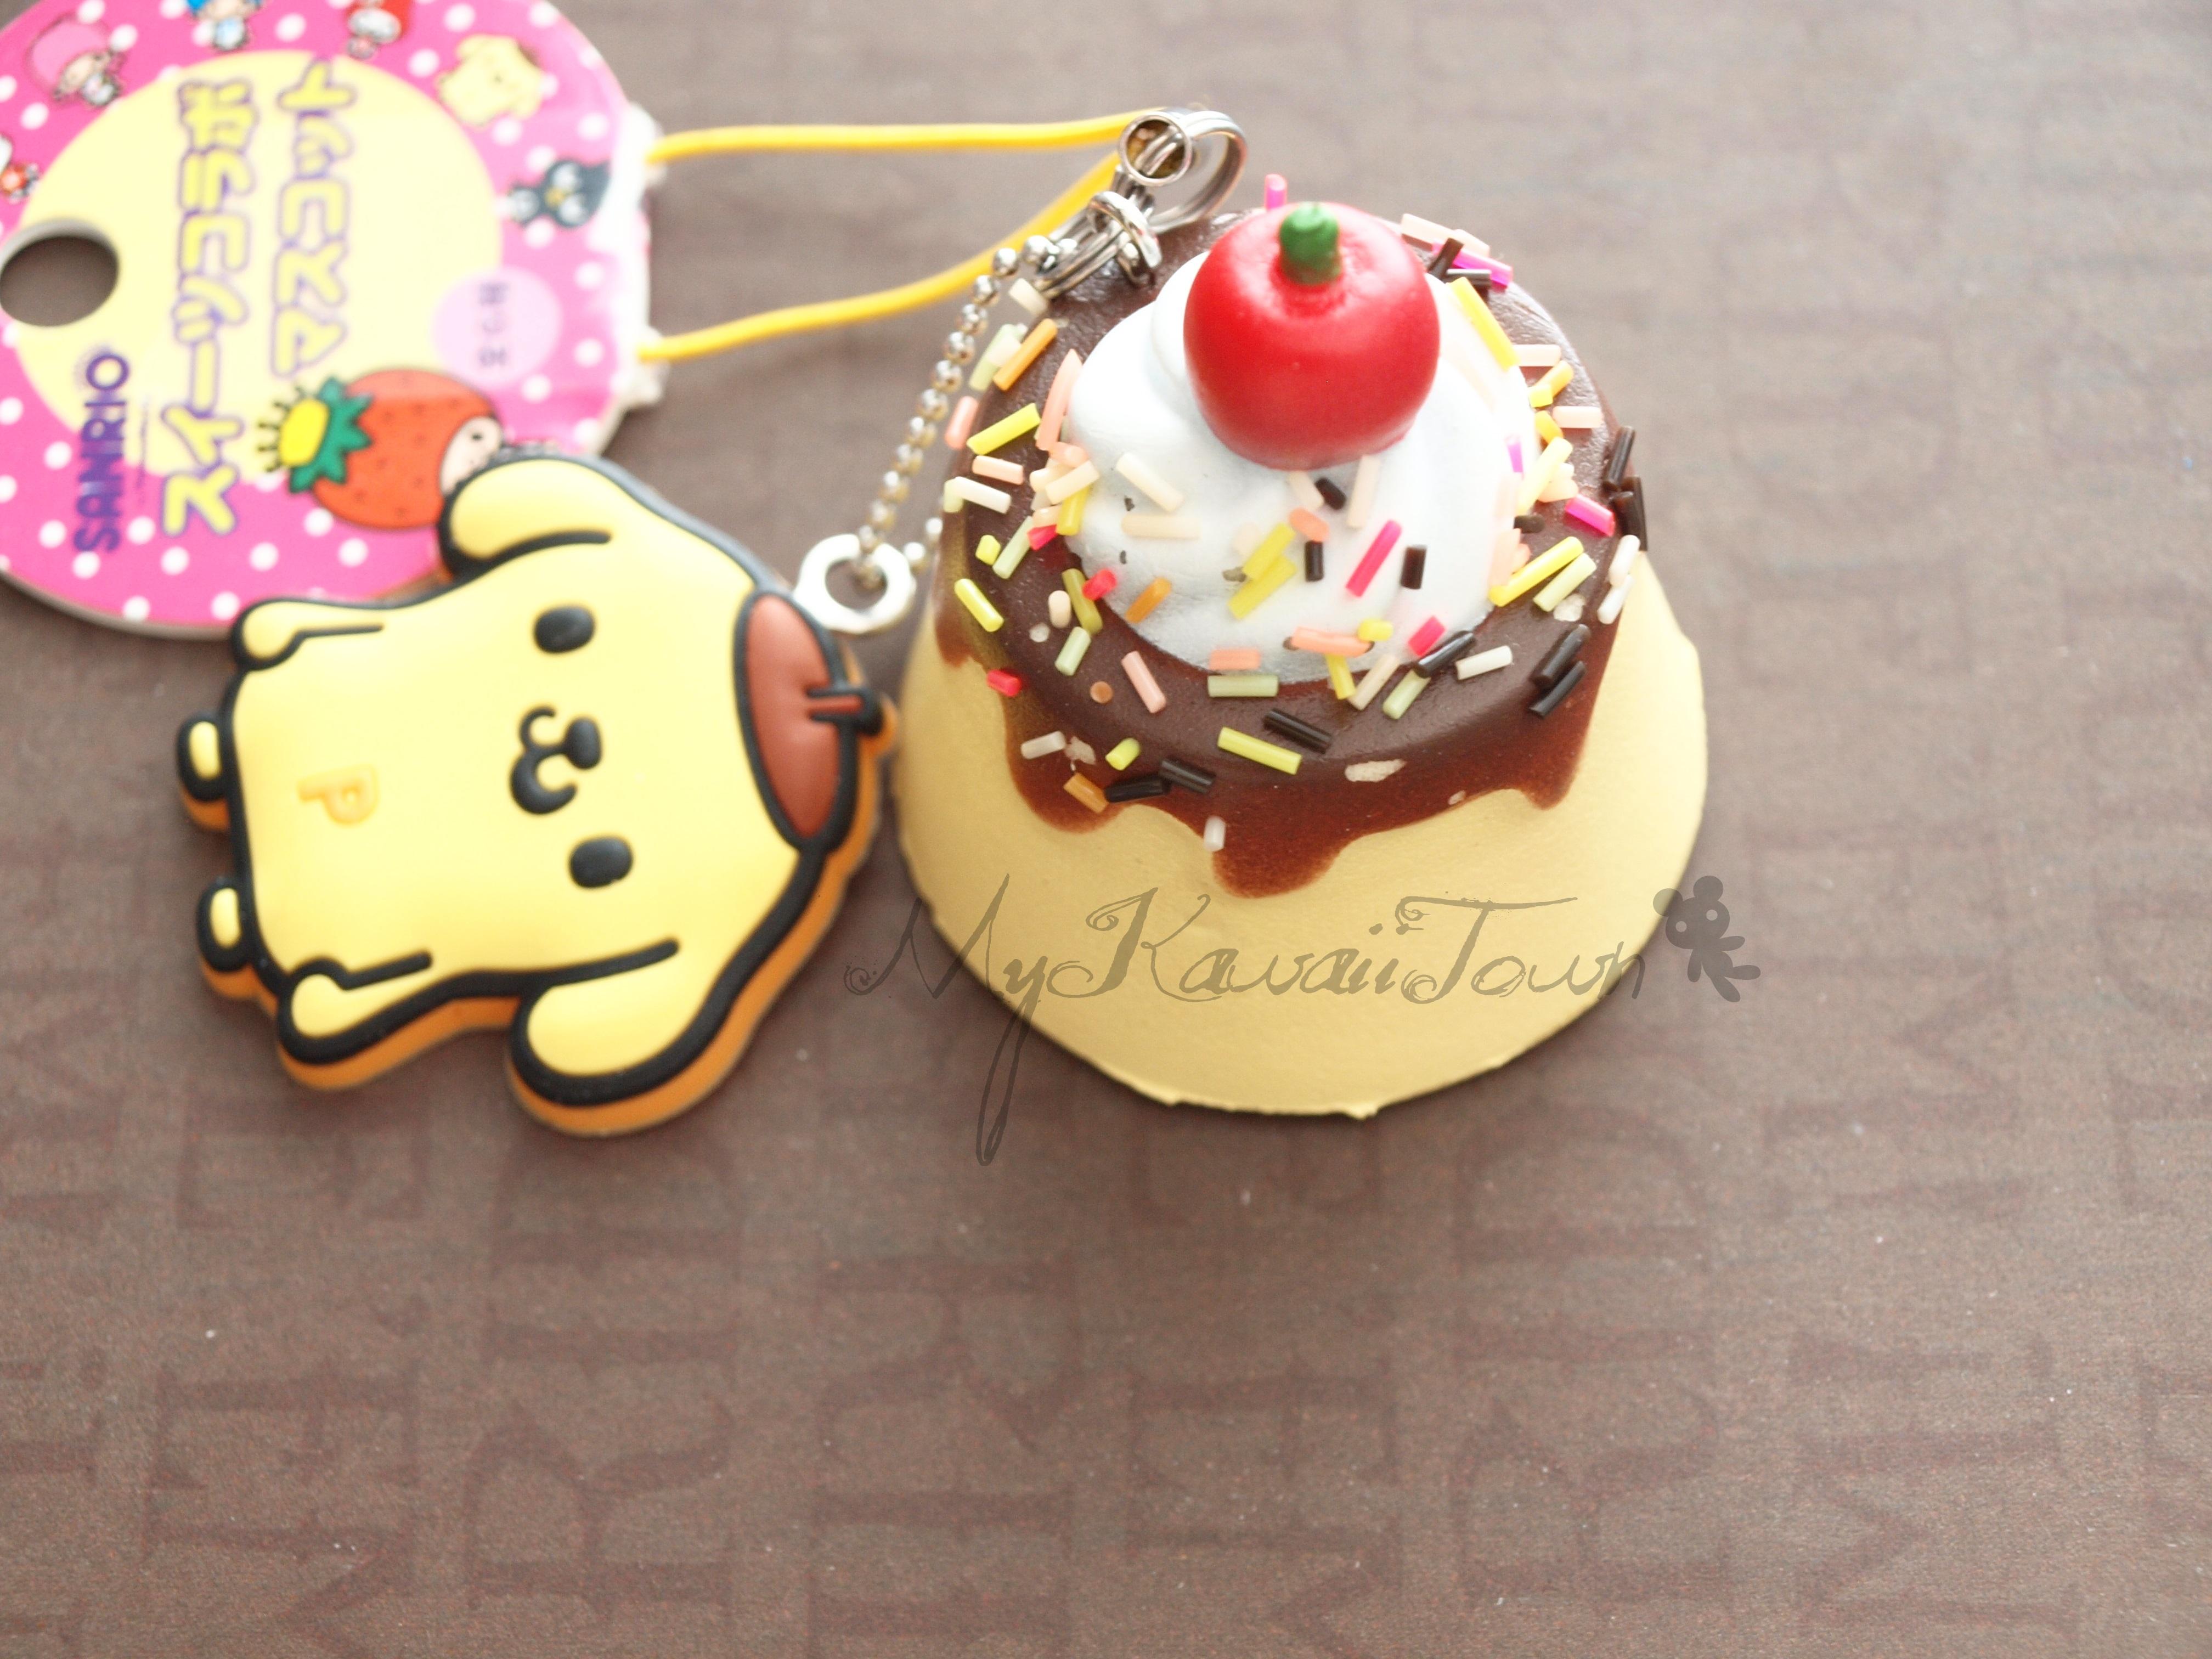 Rare Squishy Images : Mykawaiitown RARE Squishy Sanrio Pudding Online Store Powered by Storenvy